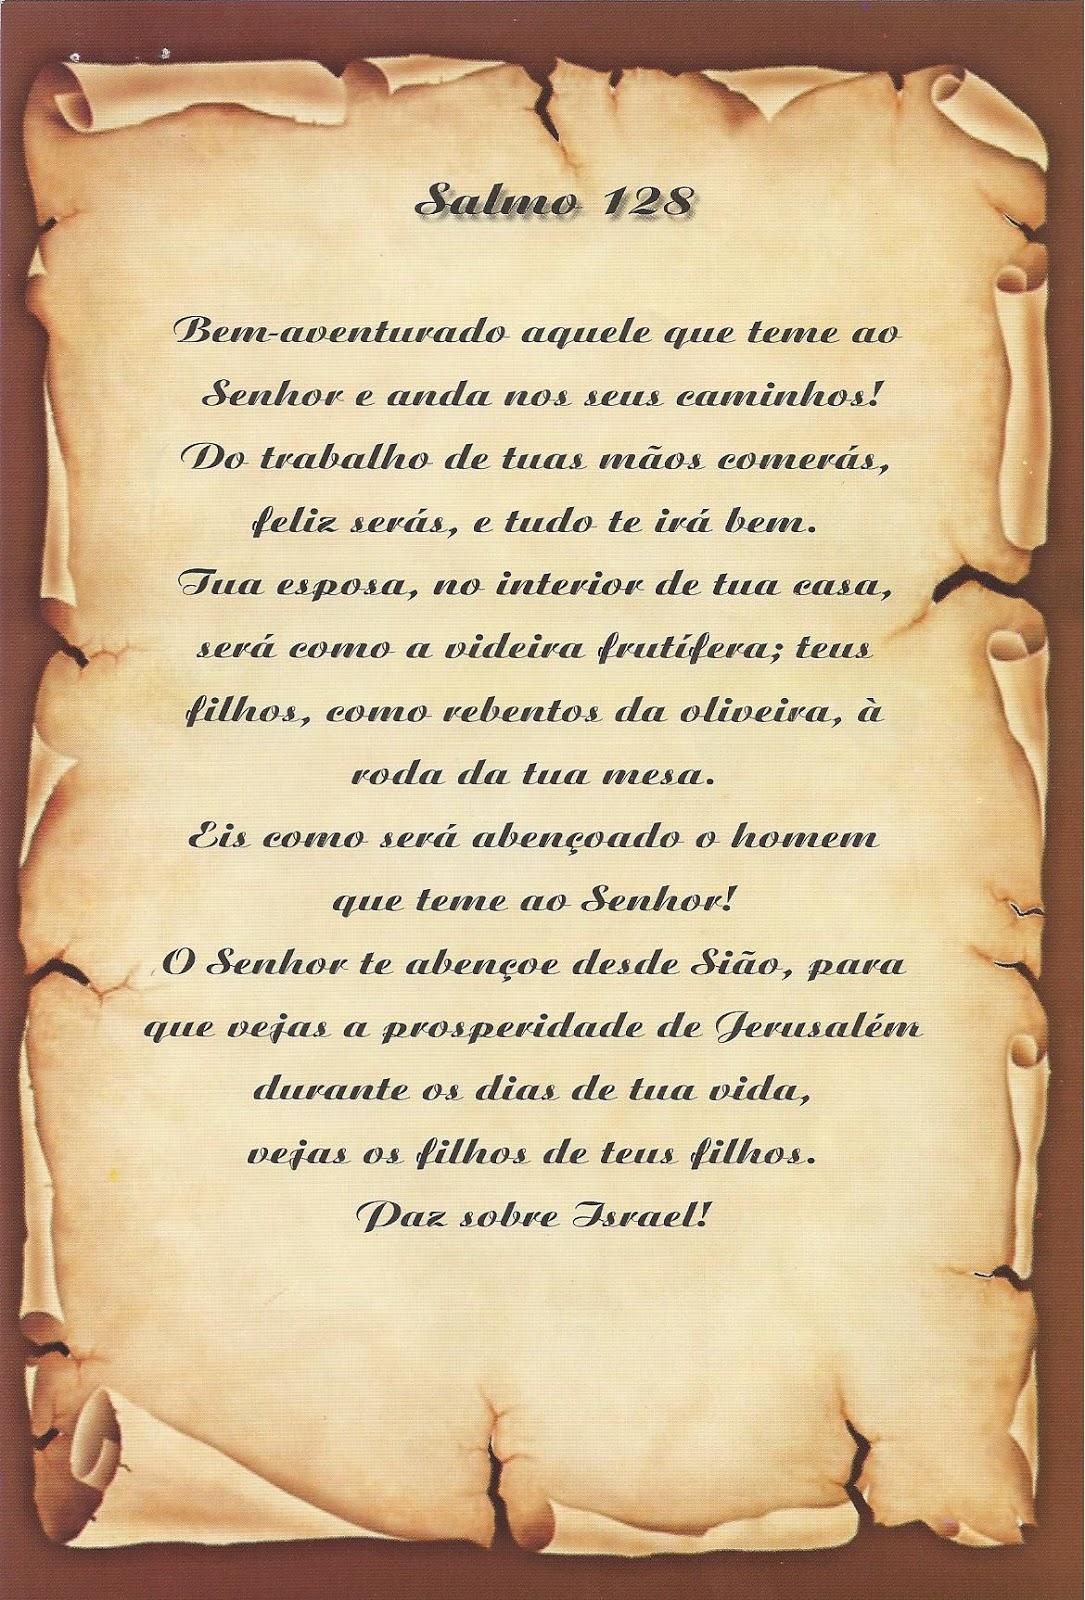 Salmo 128 Biblia Catolica Wwwtollebildcom